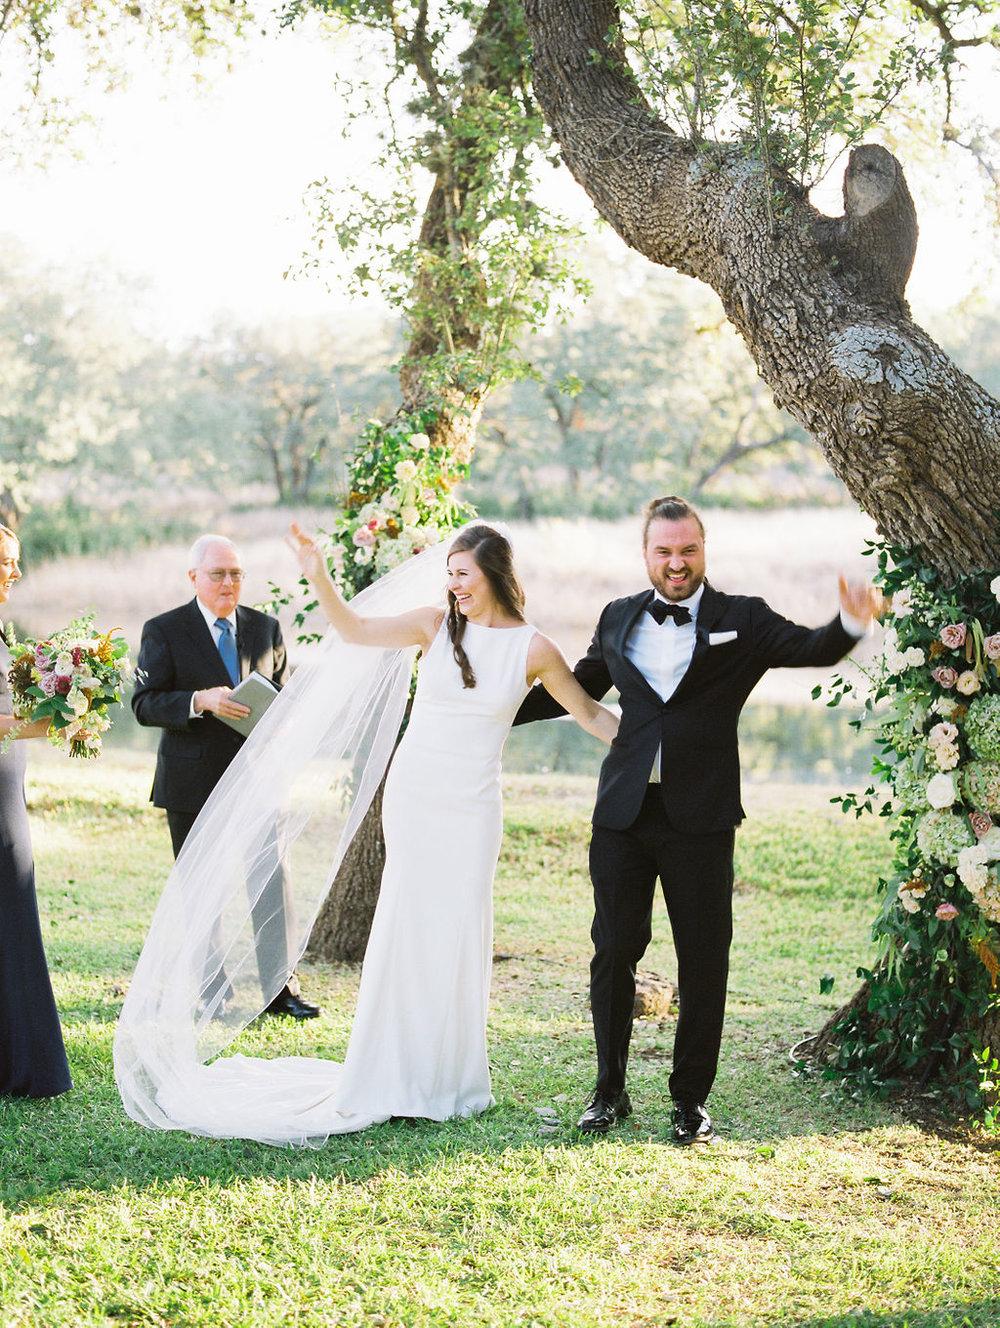 Austin-Texas-Wedding-Photographer-Addison-Grove-Film-93.jpg